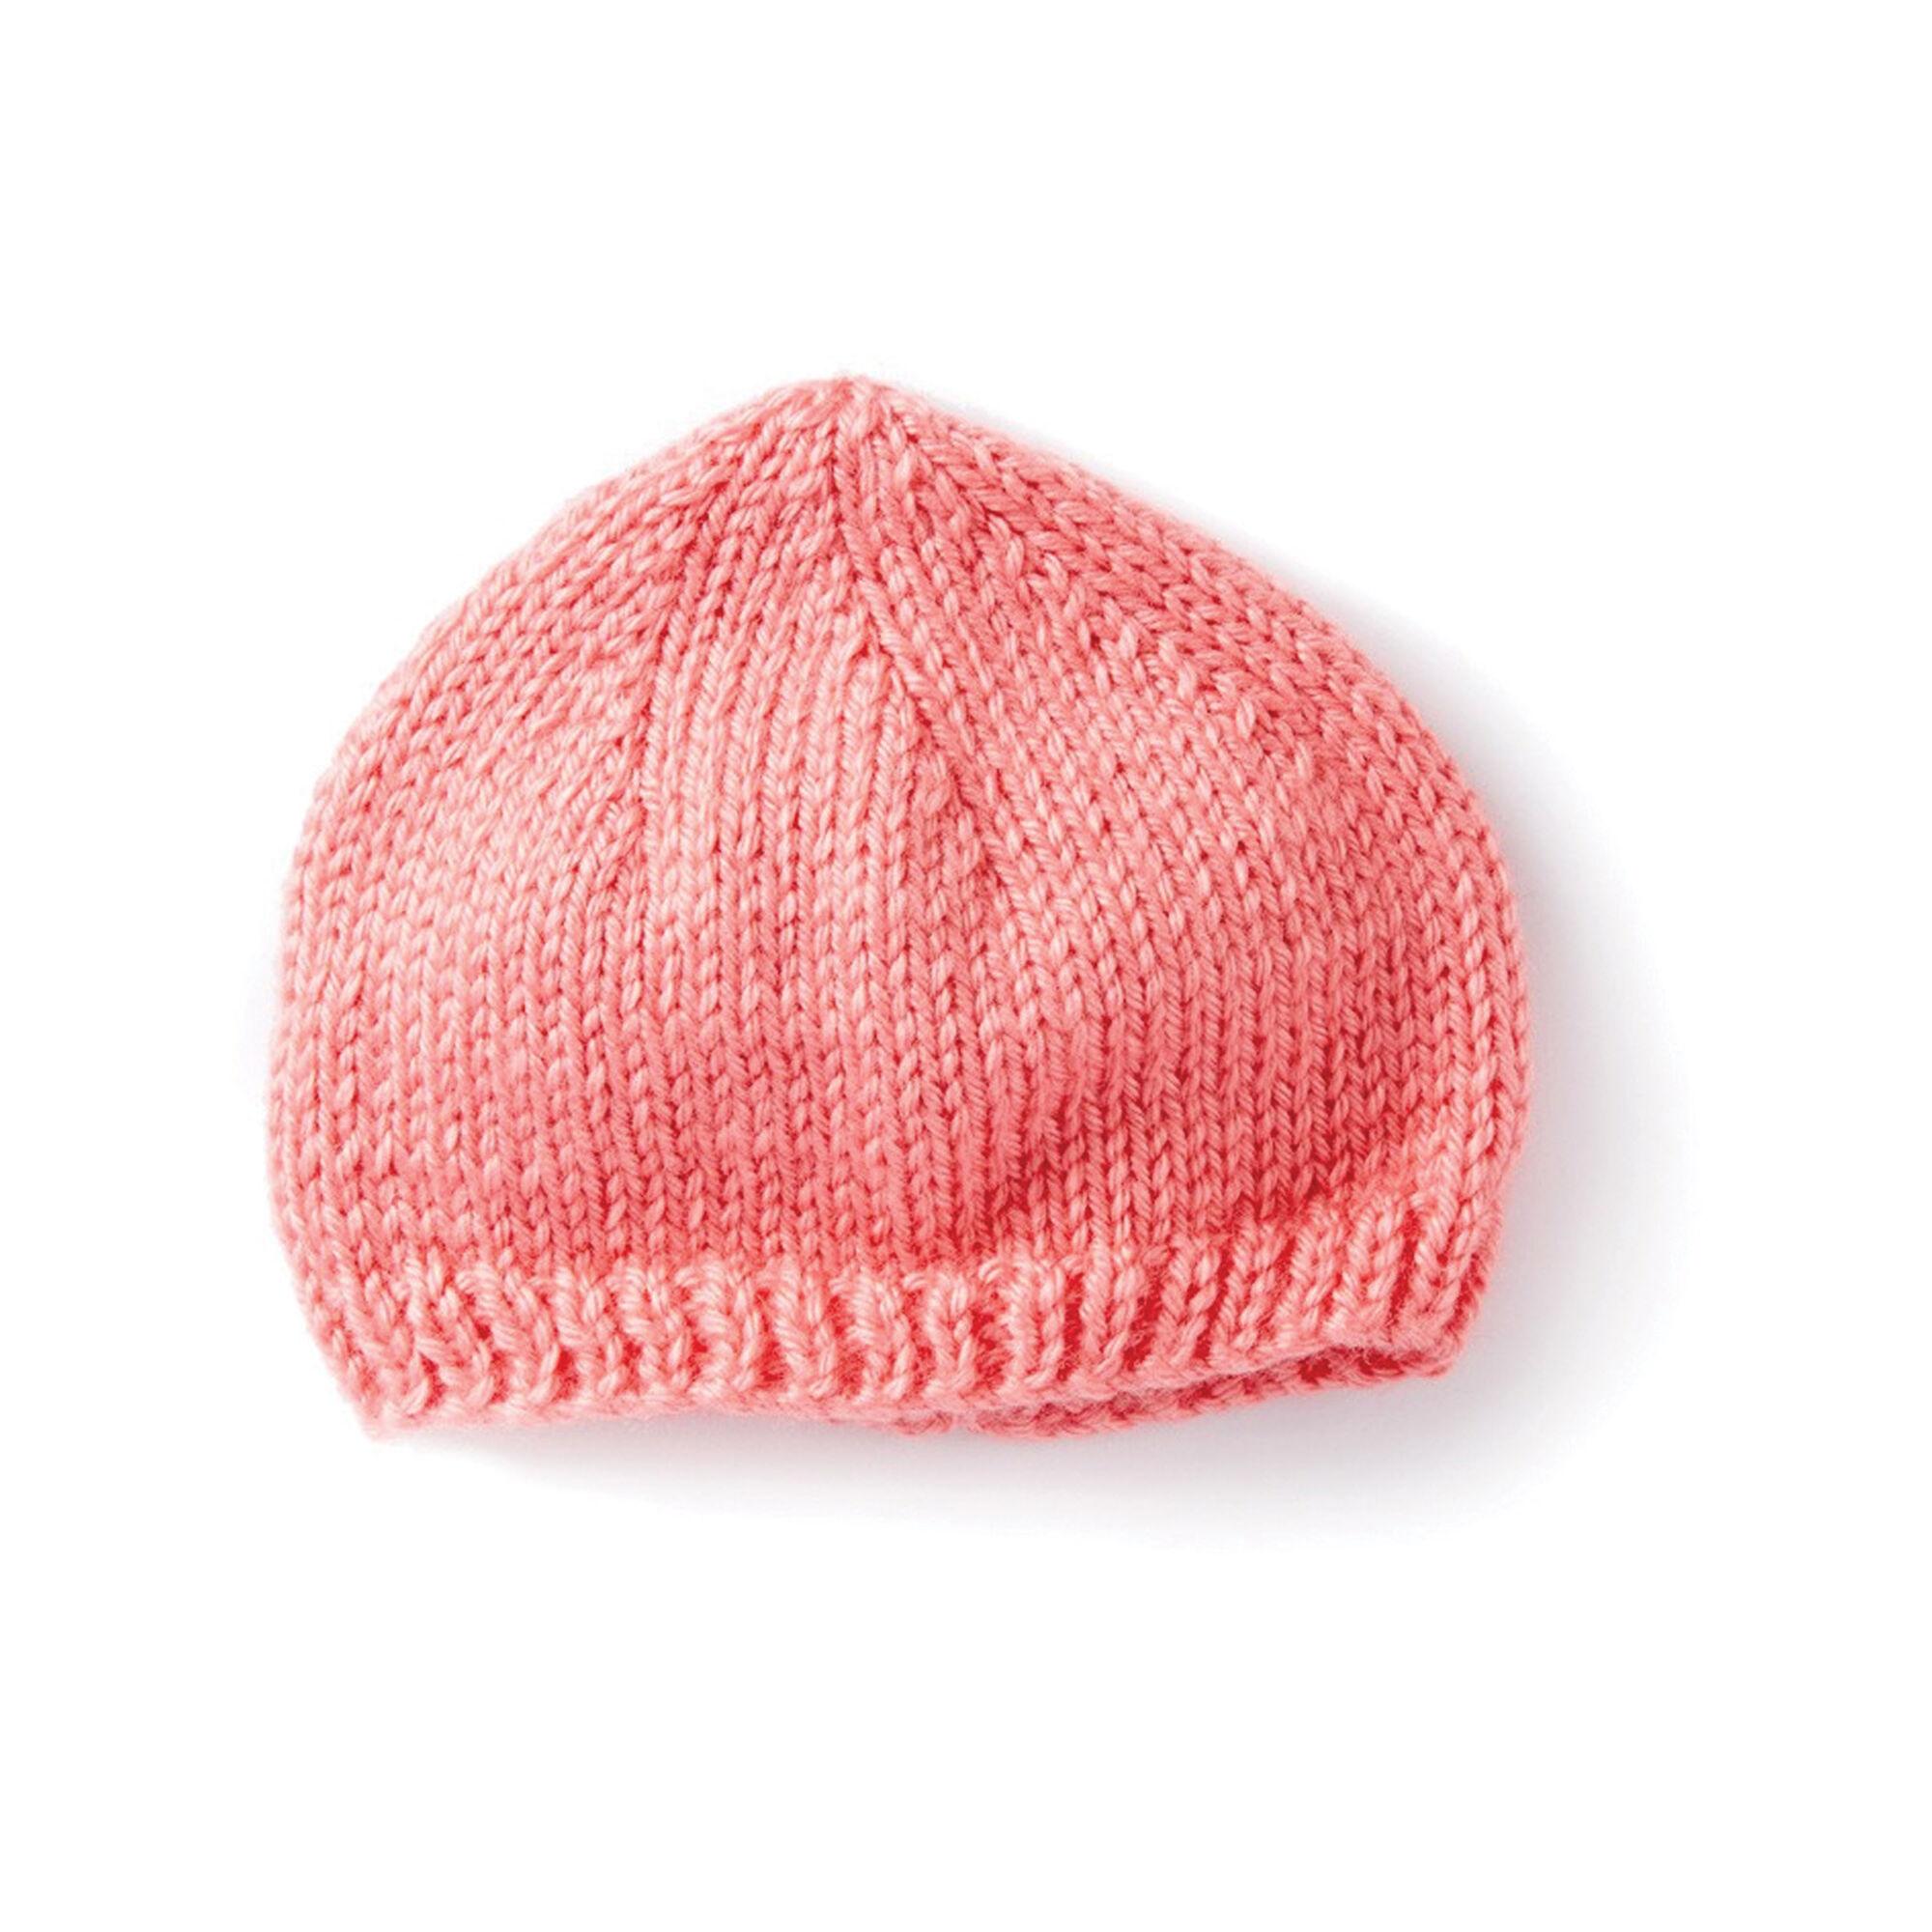 a2db5c693 Caron Wee Knit Cap | Yarnspirations